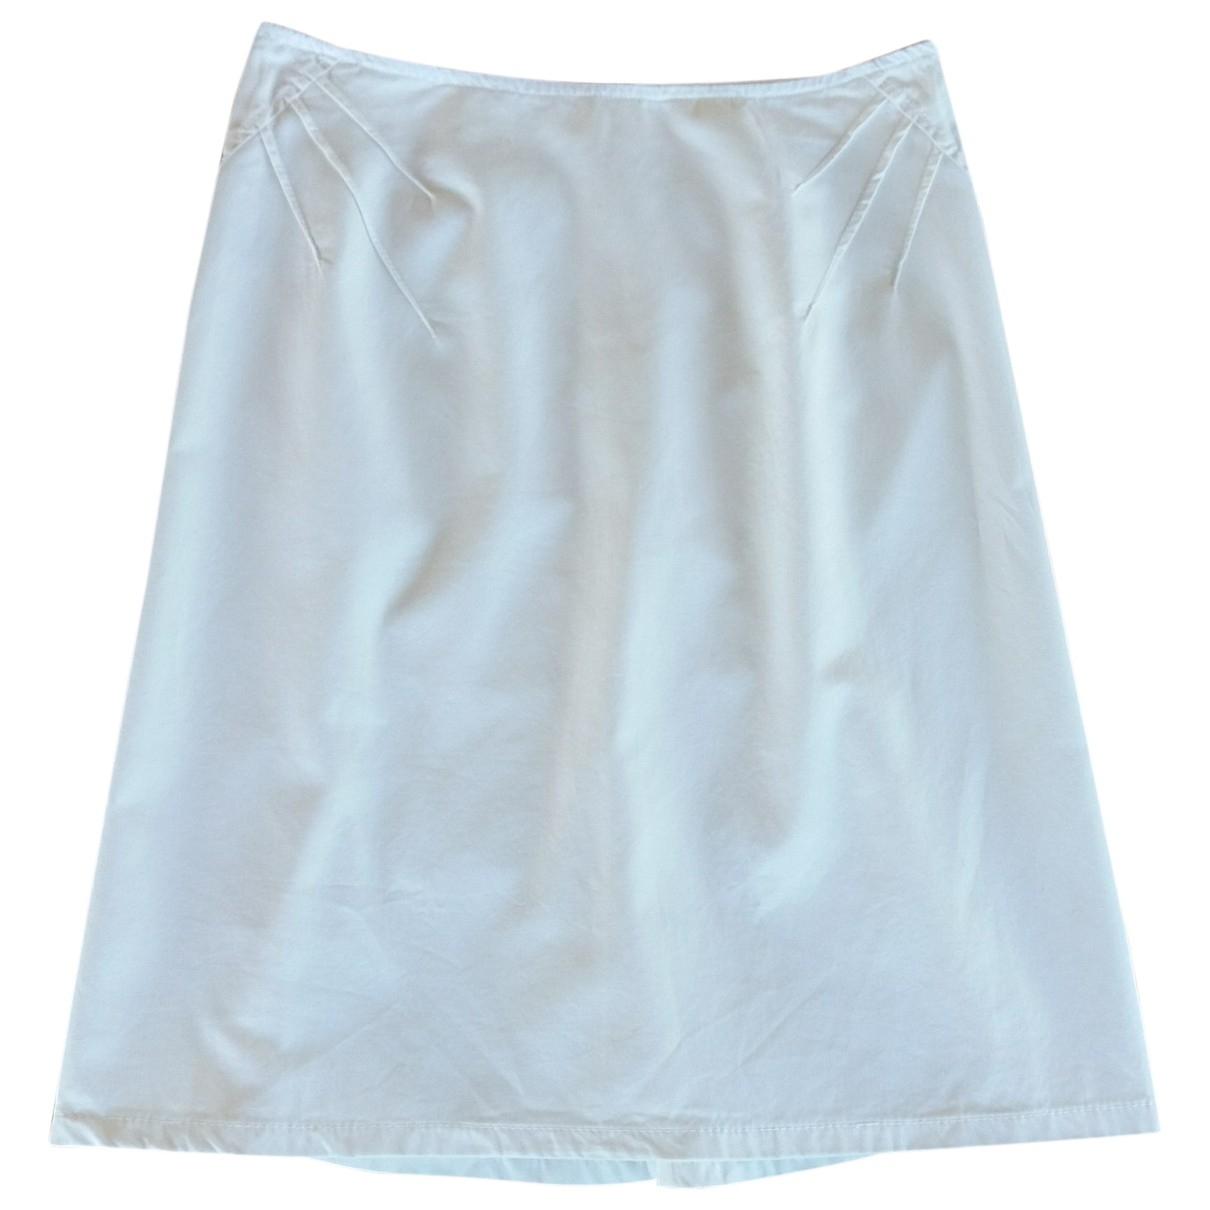 Miu Miu \N Ecru Cotton skirt for Women M International